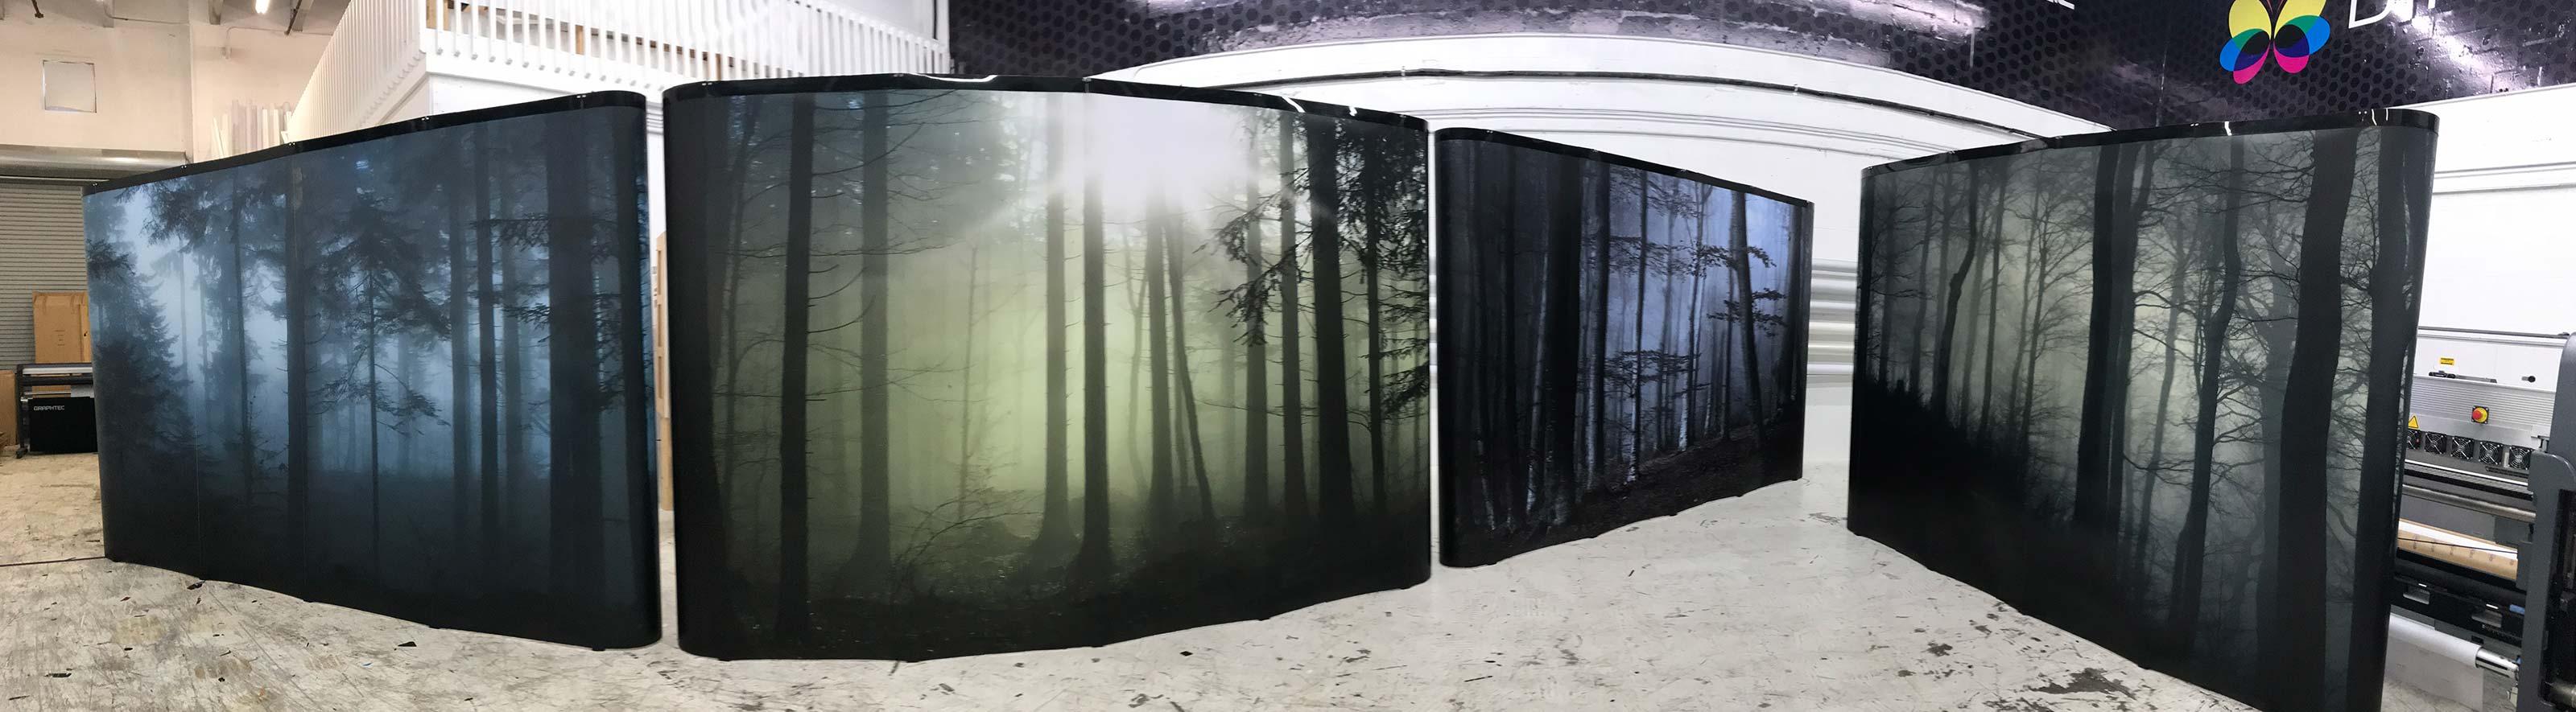 Trade Show Panorama Displays from Binick Imaging